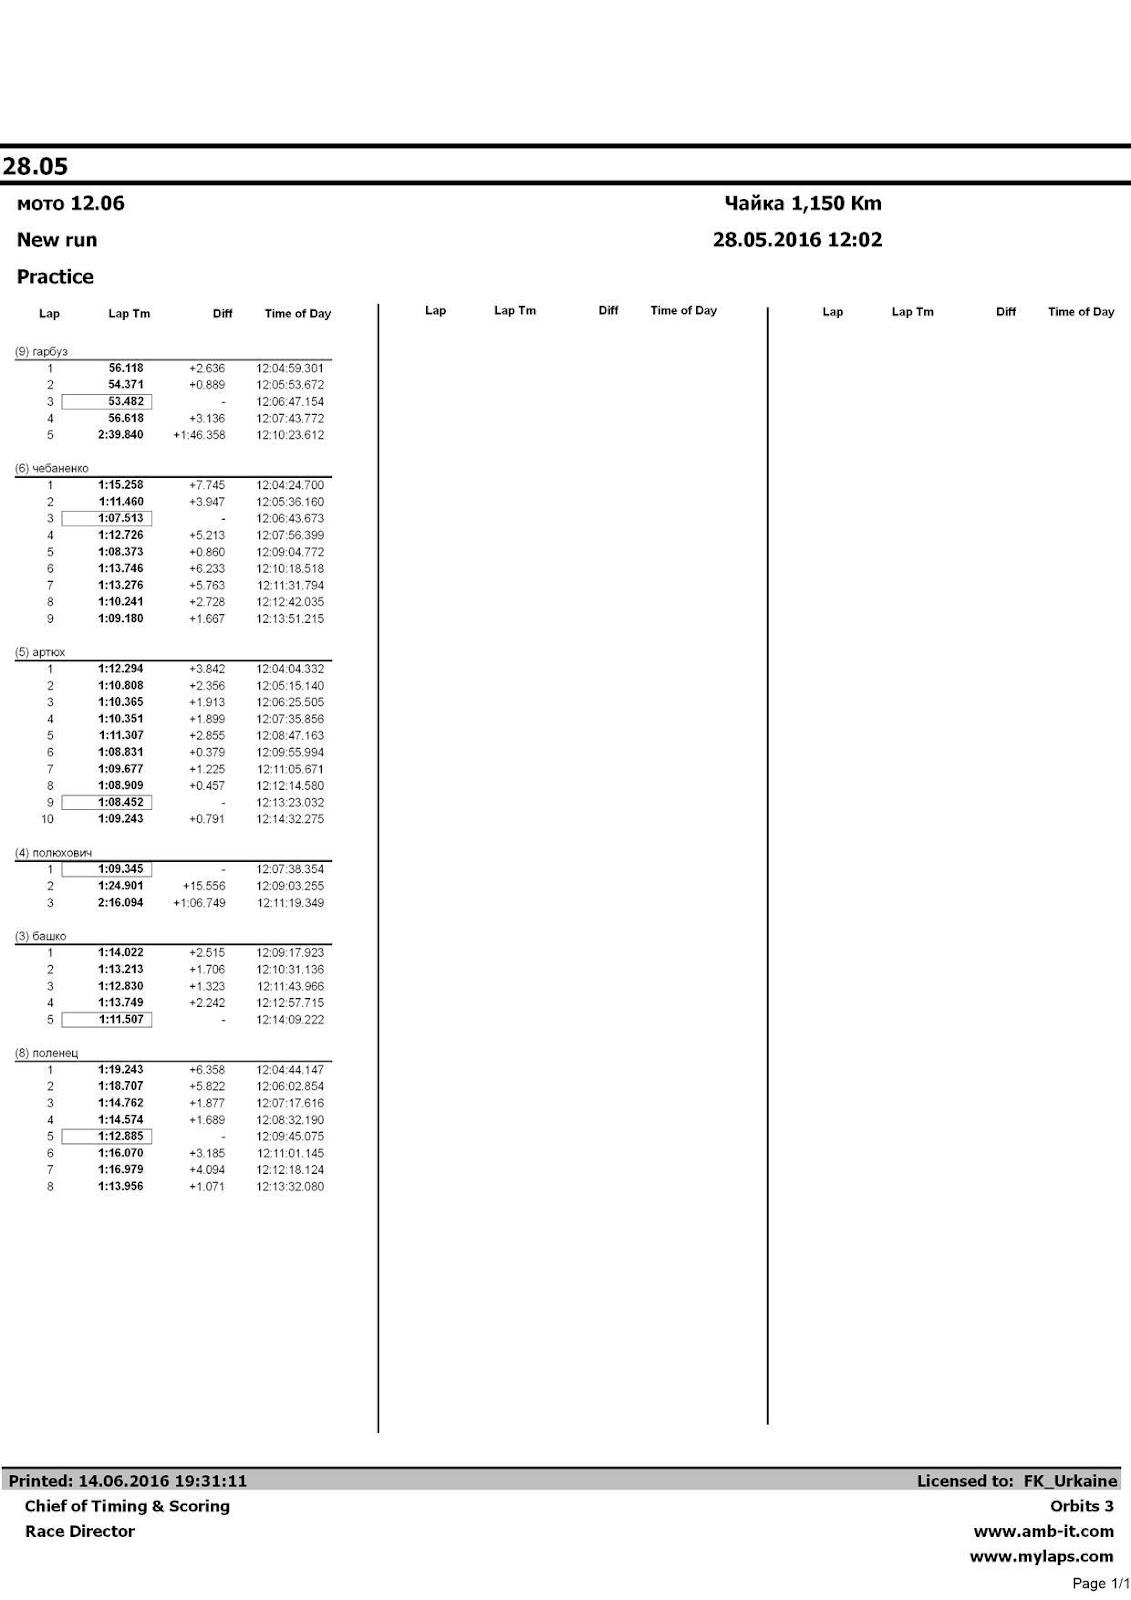 Автоматически созданный замещающий текст: Lap Lap Tm Diff Time of Day Lap Lap Tm Diff Time of Day Lap (9) гарбуз 1 2 3 4 5 (6) чебаненко 1 2 3 4 5 6 7 8 9 (5) артюх 1 2 3 4 5 6 7 8 9 10 (4) полюхович 1 2 3 (3) башко 1 2 3 4 5 (8) поленец 1 2 3 4 5 6 7 8 Lap Tm 56.118 54.371 53.482 56.618 2:39.840 1:15.258 1:11.460 1:07.513 1:12.726 1:08.373 1:13.746 1:13.276 1:10.241 1:09.180 1:12.294 1:10.808 1:10.365 1:10.351 1:11.307 1:08.831 1:09.677 1:08.909 1:08.452 1:09.243 1:09.345 1:24.901 2:16.094 1:14.022 1:13.213 1:12.830 1:13.749 1:11.507 1:19.243 1:18.707 1:14.762 1:14.574 1:12.885 1:16.070 1:16.979 1:13.956 Diff +2.636 +0.889 - +3.136 +1:46.358 +7.745 +3.947 - +5.213 +0.860 +6.233 +5.763 +2.728 +1.667 +3.842 +2.356 +1.913 +1.899 +2.855 +0.379 +1.225 +0.457 - +0.791 - +15.556 +1:06.749 +2.515 +1.706 +1.323 +2.242 - +6.358 +5.822 +1.877 +1.689 - +3.185 +4.094 +1.071 Time of Day 12:04:59.301 12:05:53.672 12:06:47.154 12:07:43.772 12:10:23.612 12:04:24.700 12:05:36.160 12:06:43.673 12:07:56.399 12:09:04.772 12:10:18.518 12:11:31.794 12:12:42.035 12:13:51.215 12:04:04.332 12:05:15.140 12:06:25.505 12:07:35.856 12:08:47.163 12:09:55.994 12:11:05.671 12:12:14.580 12:13:23.032 12:14:32.275 12:07:38.354 12:09:03.255 12:11:19.349 12:09:17.923 12:10:31.136 12:11:43.966 12:12:57.715 12:14:09.222 12:04:44.147 12:06:02.854 12:07:17.616 12:08:32.190 12:09:45.075 12:11:01.145 12:12:18.124 12:13:32.080 28.05 мото 12.06 New run Practice Чайка 1,150 Km 28.05.2016 12:02 Printed: 14.06.2016 19:31:11 Chief of Timing & Scoring Race Director Licensed to: FK_Urkaine Orbits 3 www.amb-it.com www.mylaps.com Page 1/1